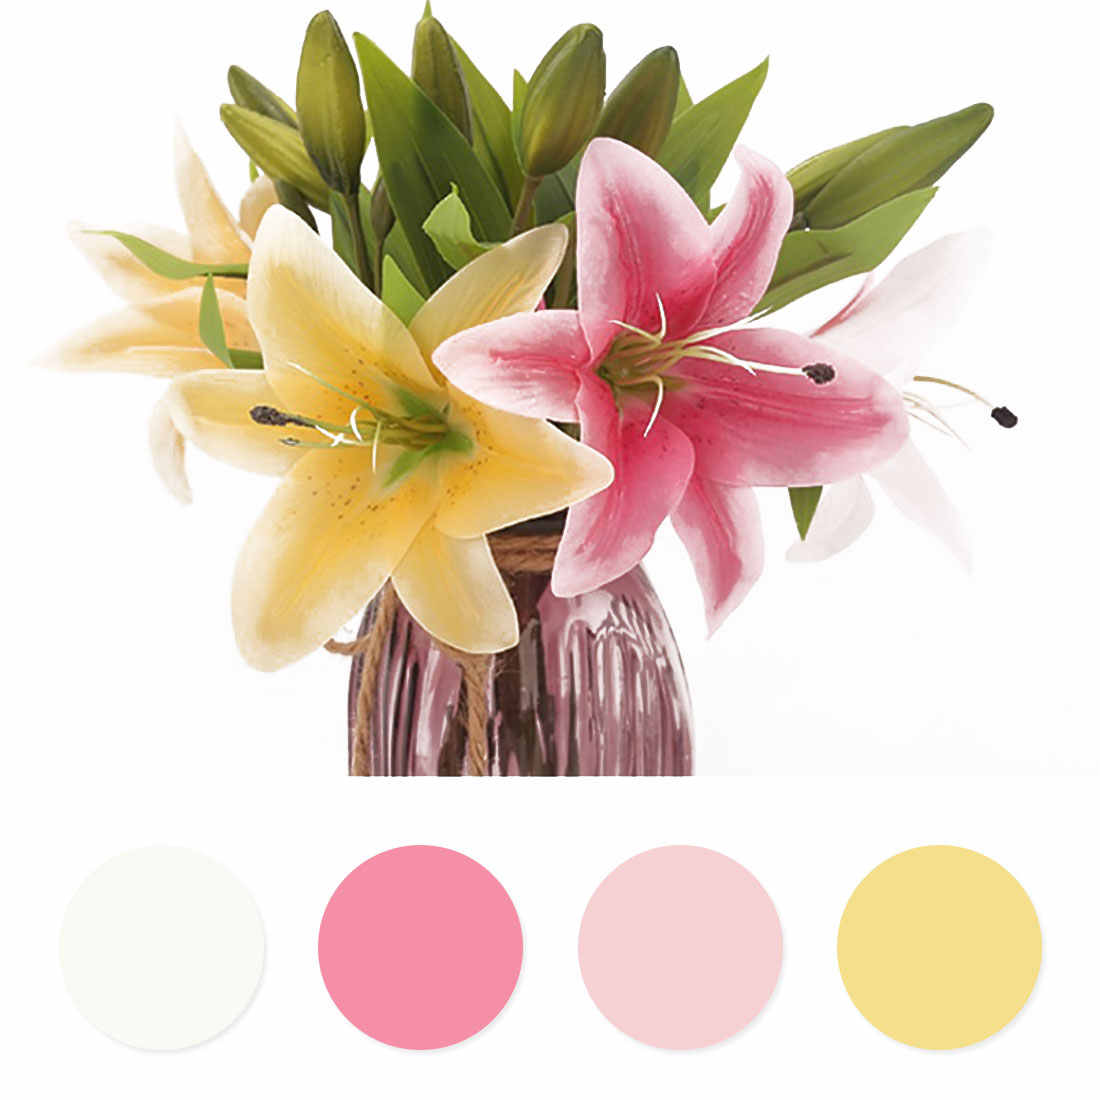 1 Pcs Bunga Palsu Buatan Lily Flores Sentuhan Nyata Buket Pengantin Pernikahan Tanaman Putih Lily Rumah Pesta Dekorasi untuk Layar